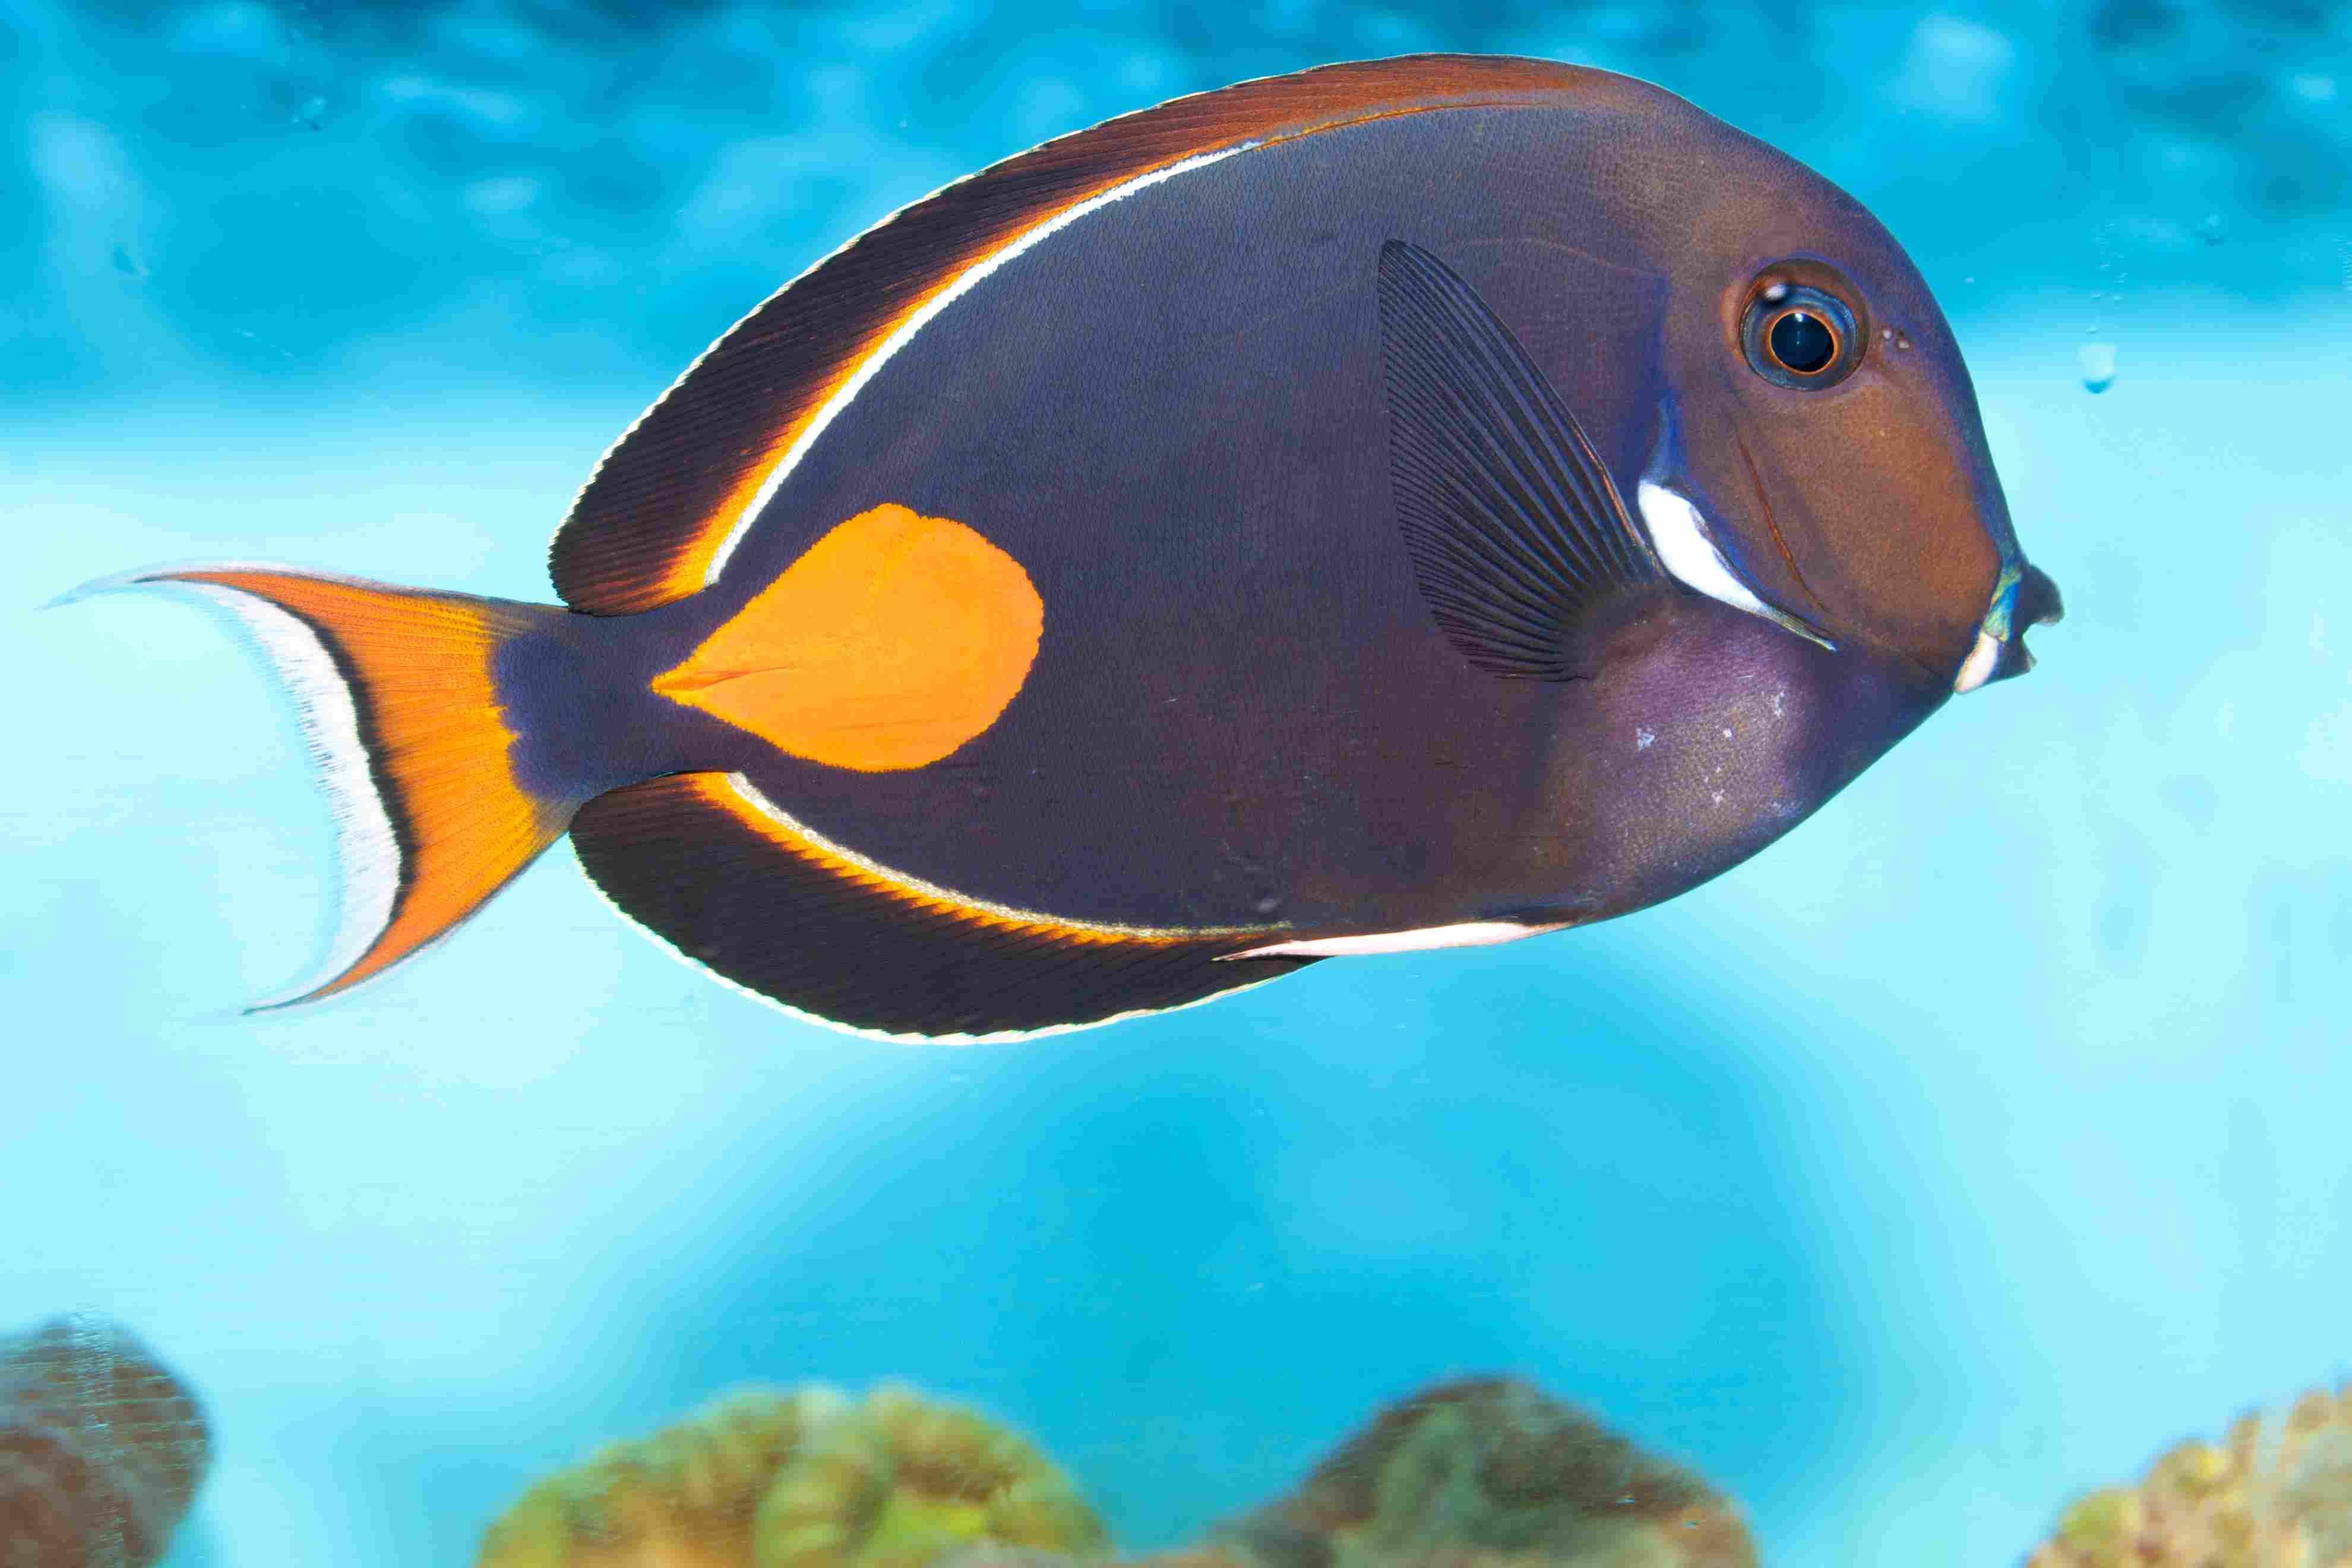 Achilles Tang or Surgeon Fish